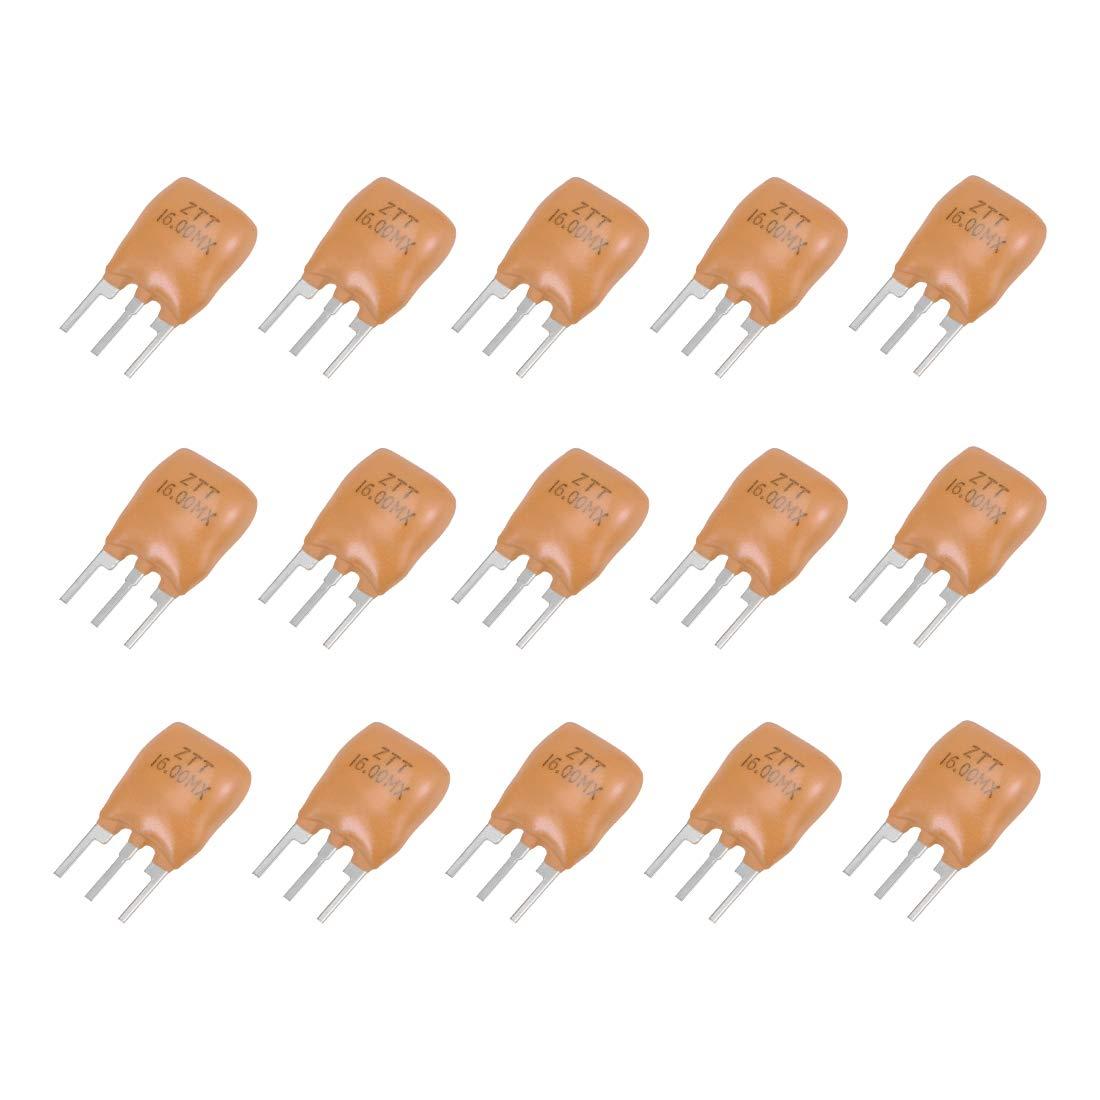 USA Seller Free Shipping 5 x 16.000 MHz CERAMIC RESONATOR 3-PINS ZTT Series